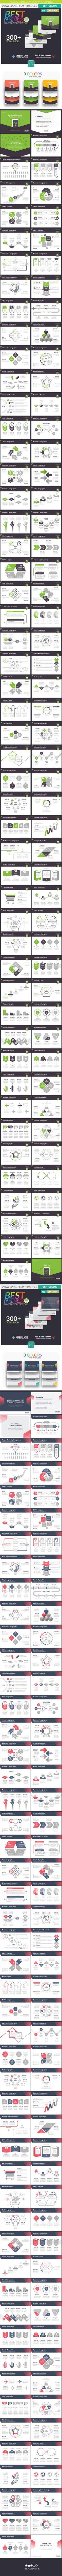 Best Business 001 -  PowerPoint Template